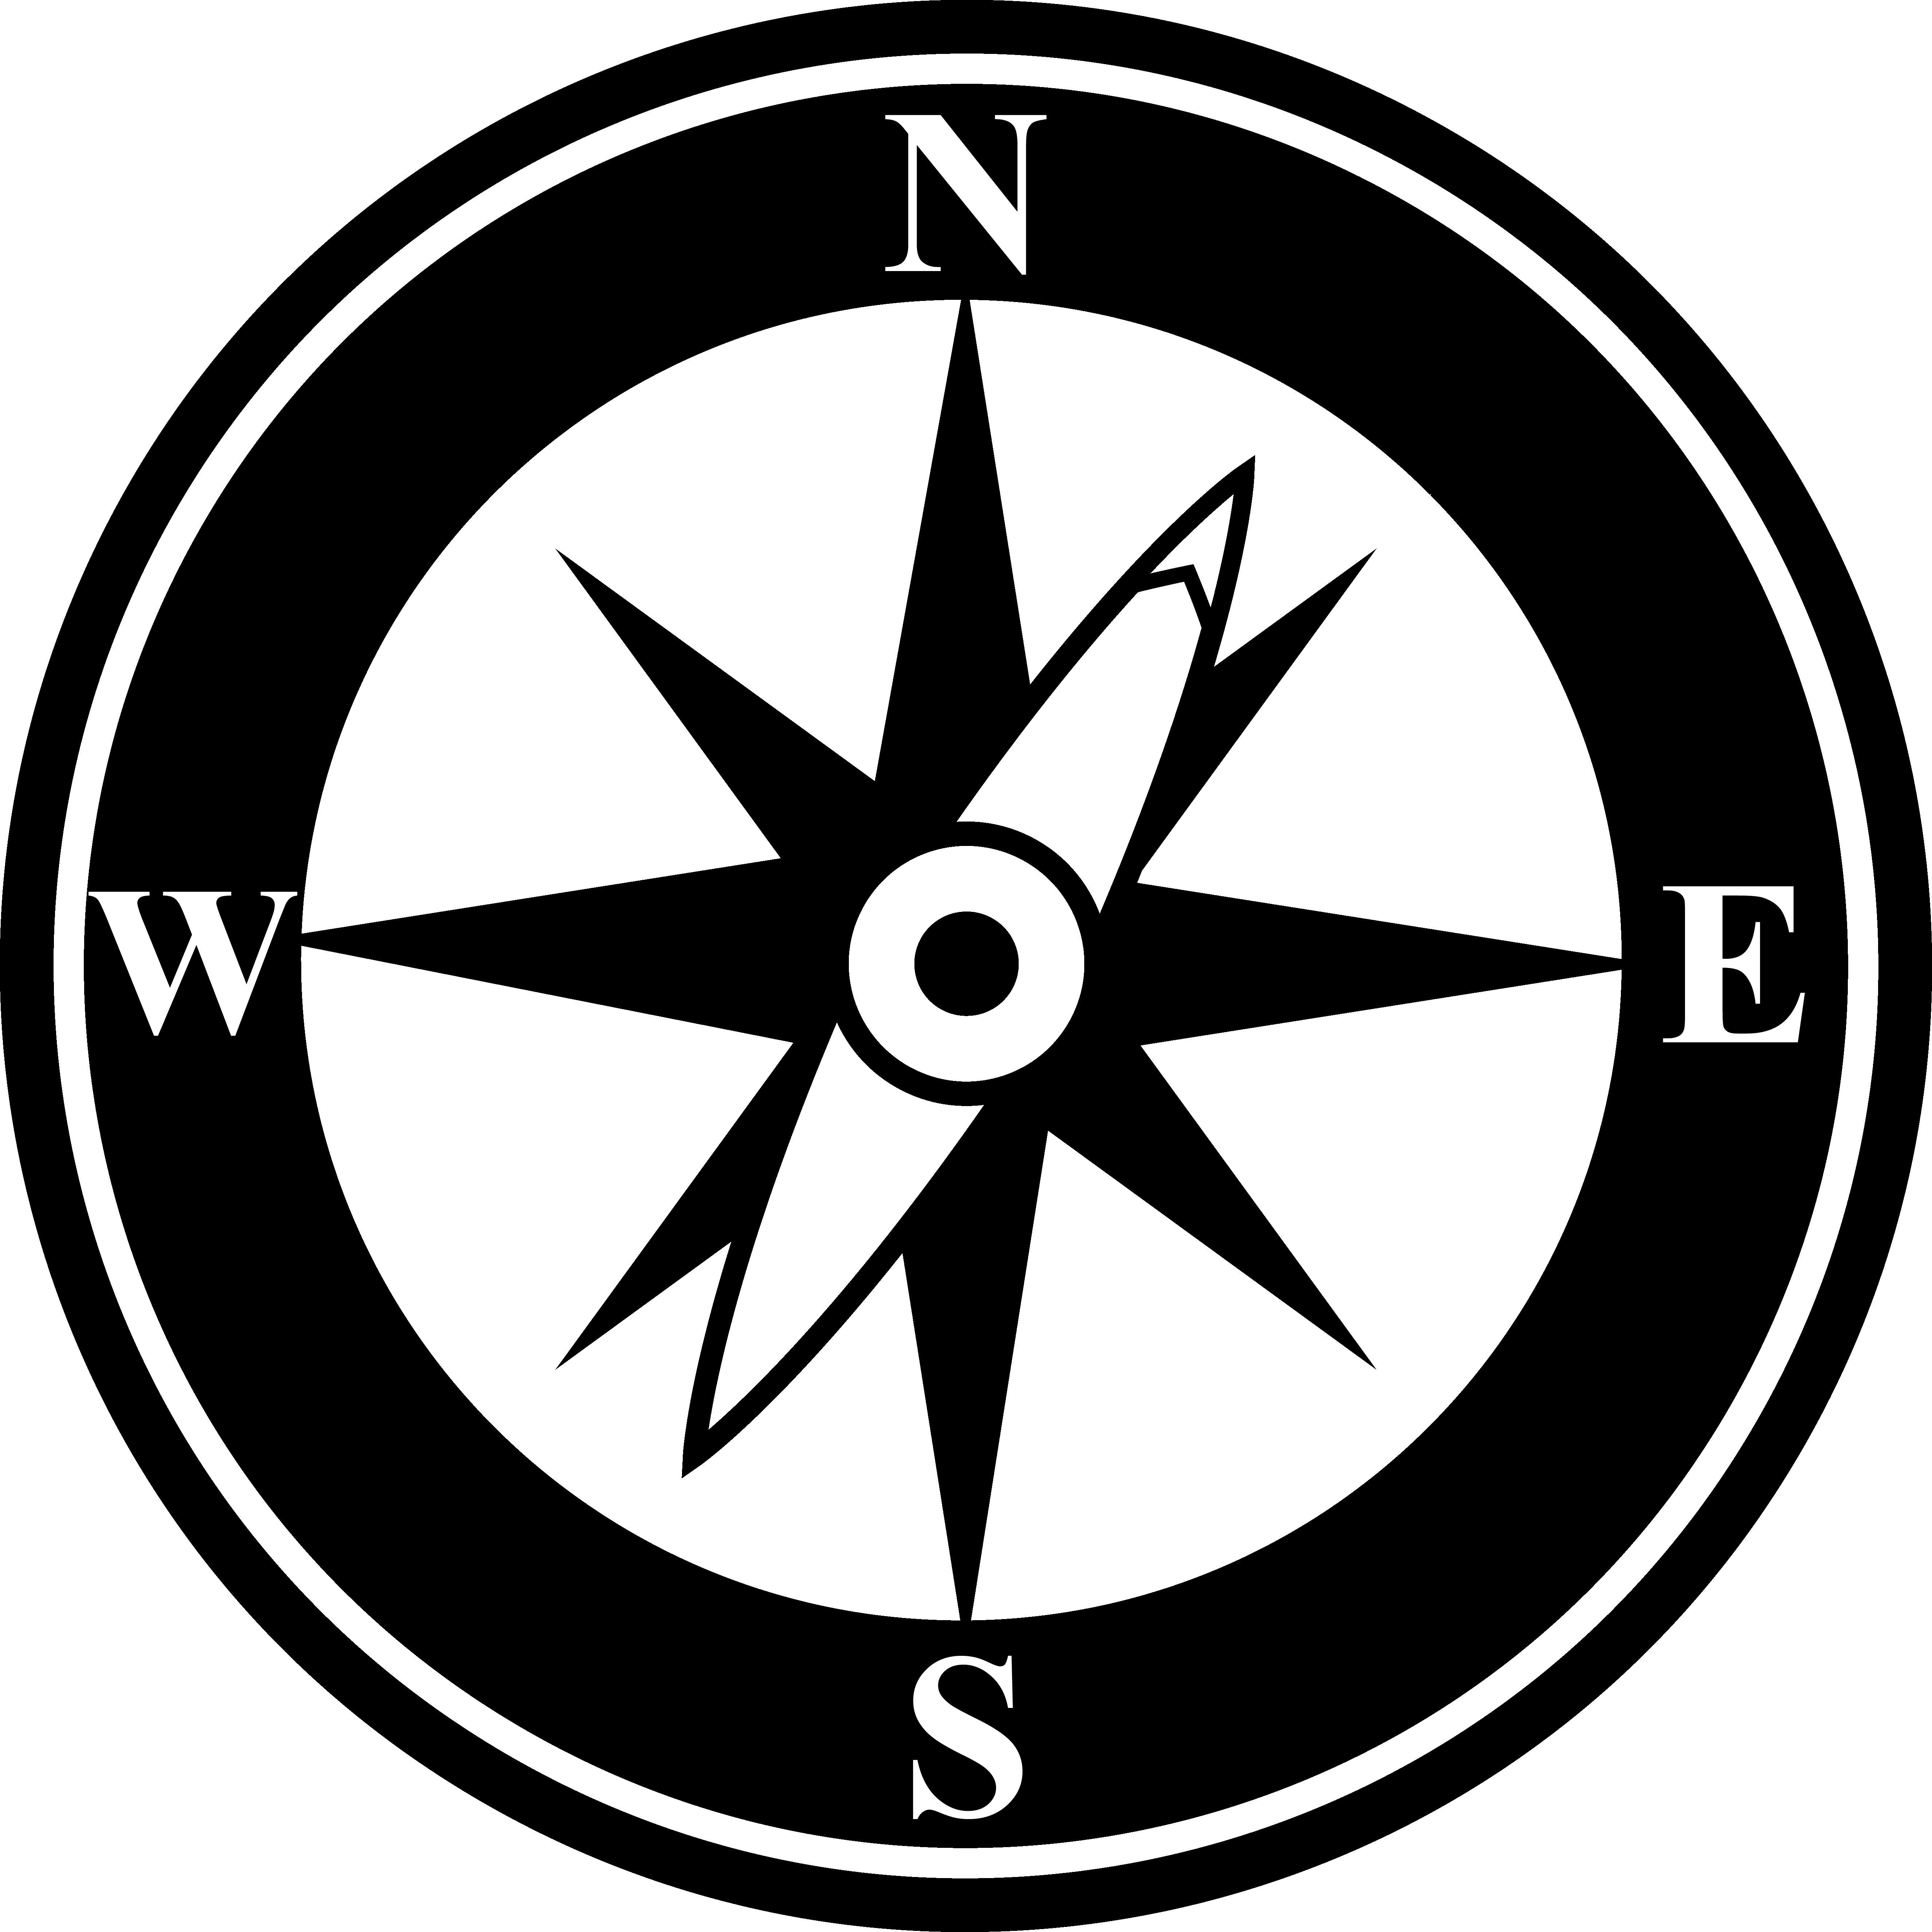 5303x5303 Black Compass Silhouette